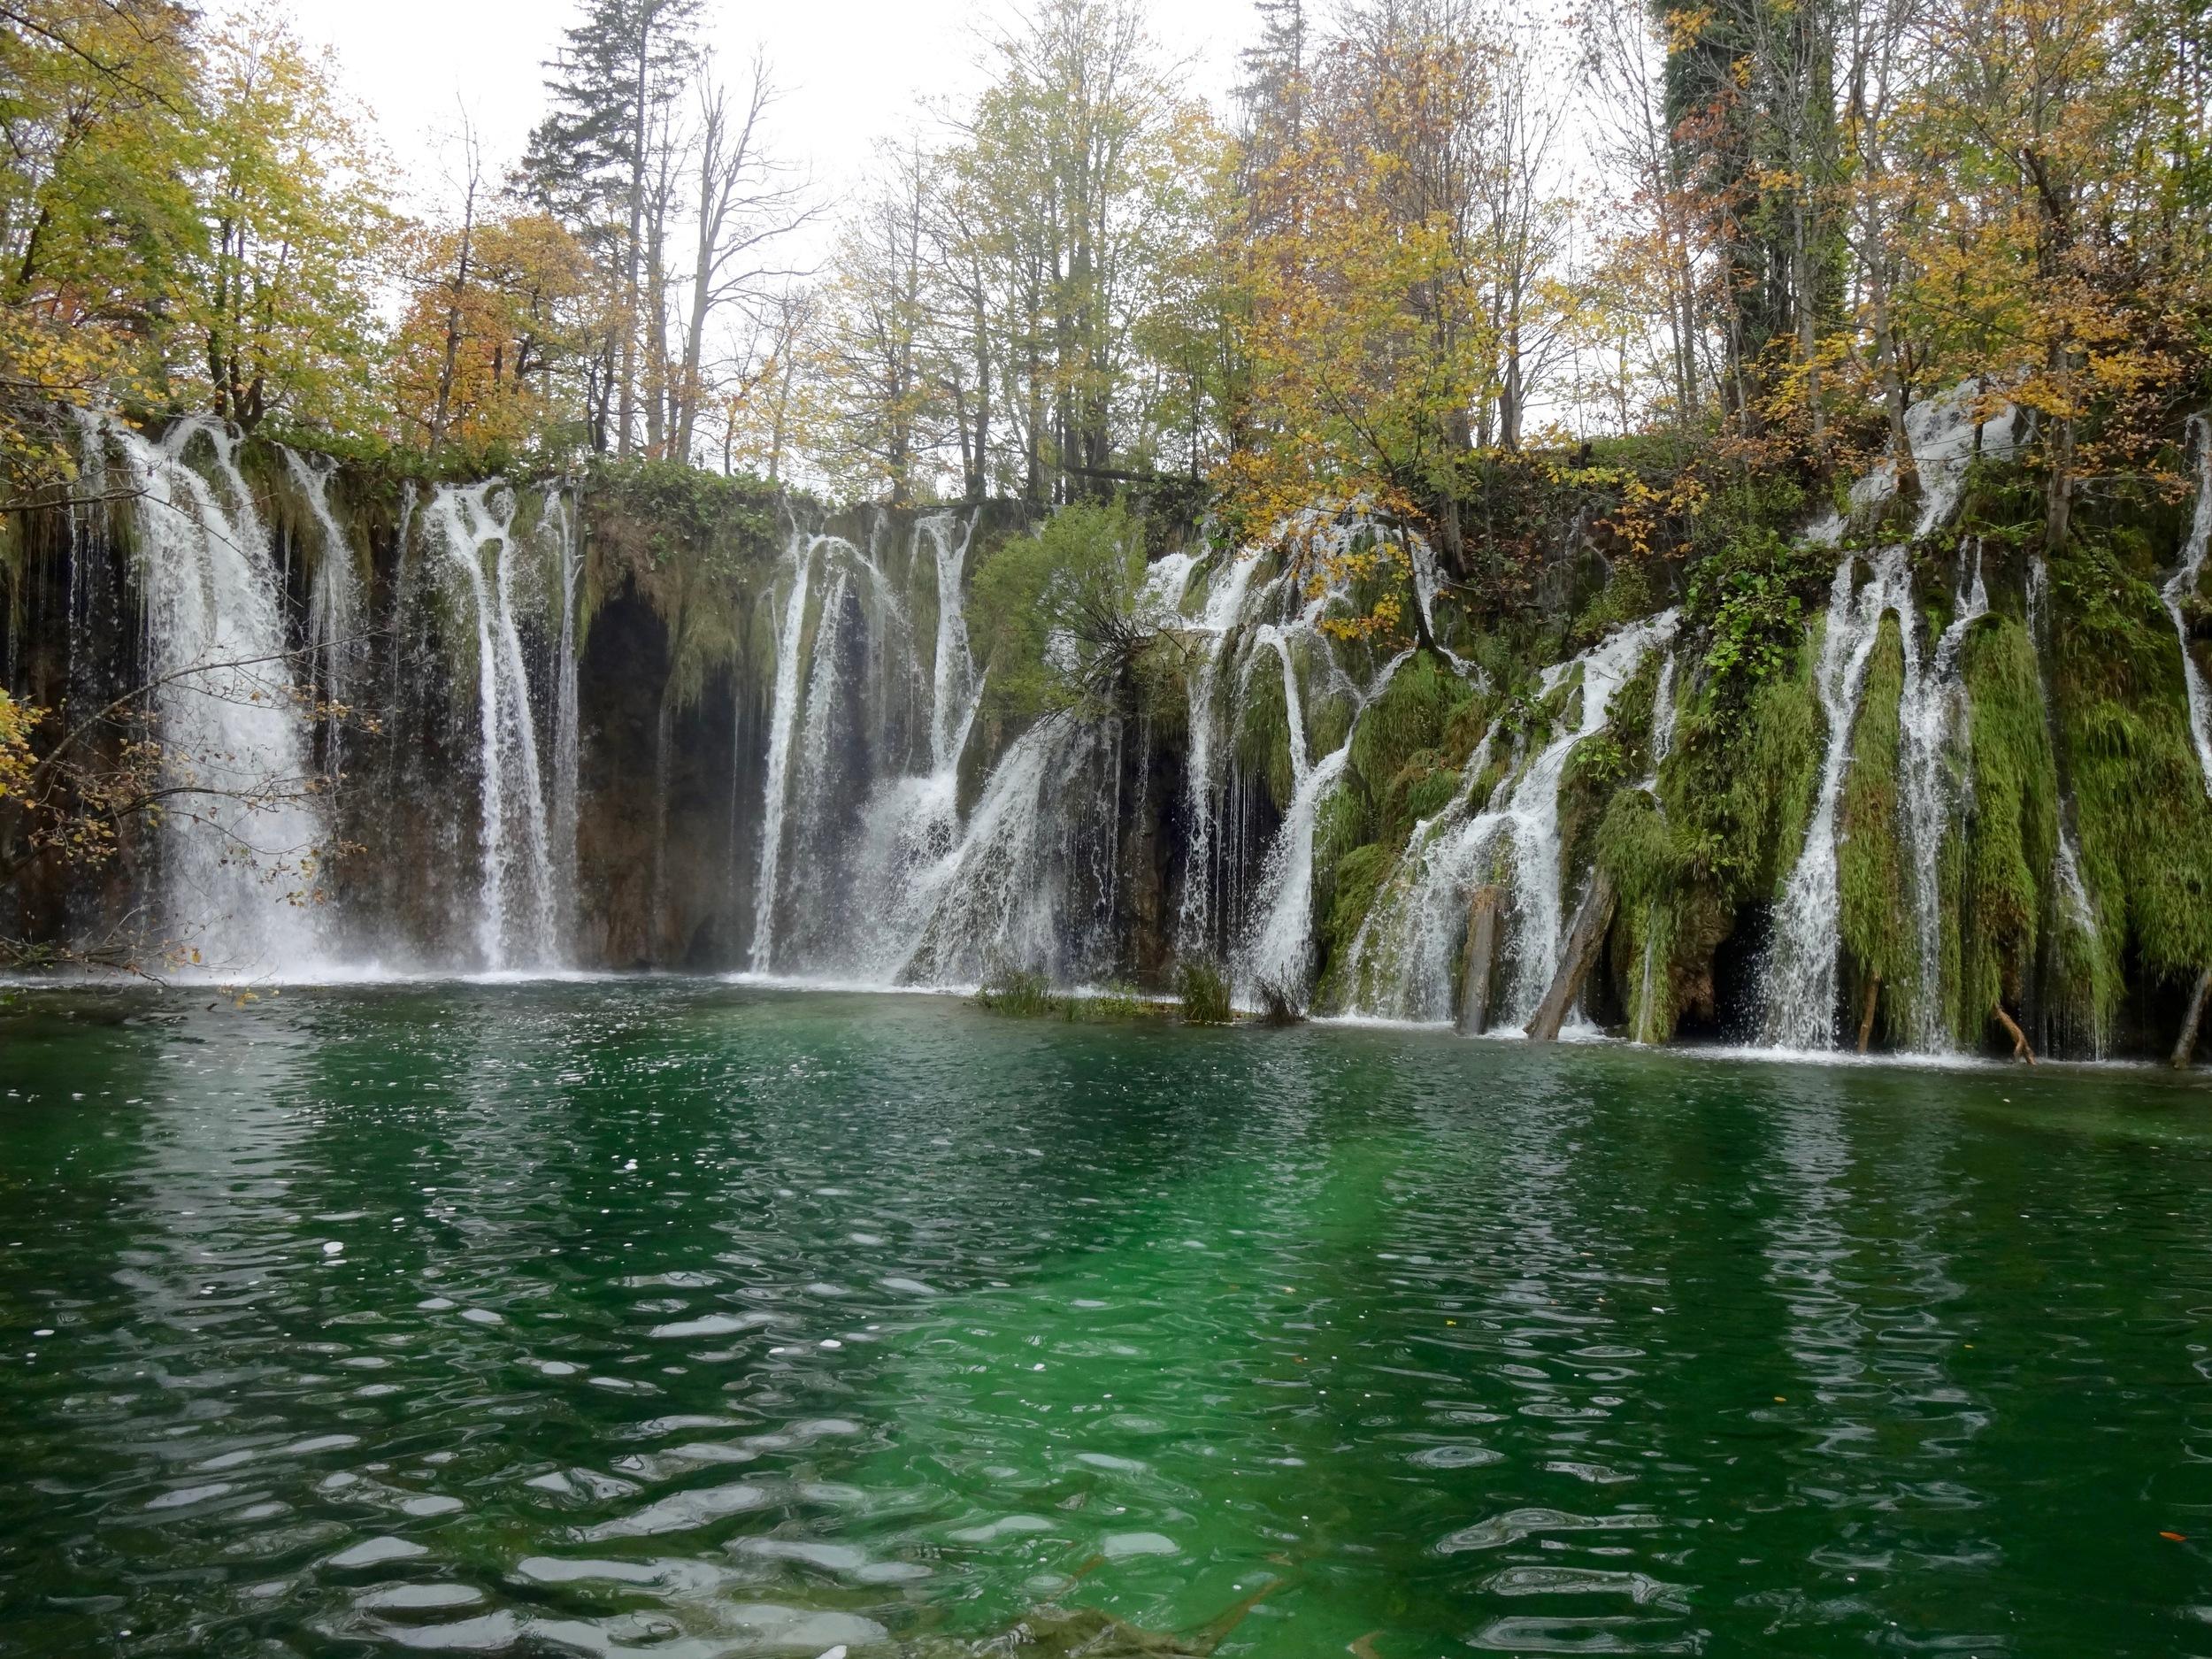 PLITVICE LAKES NATIONAL PARK, CROATIA - M.QUIGLEY